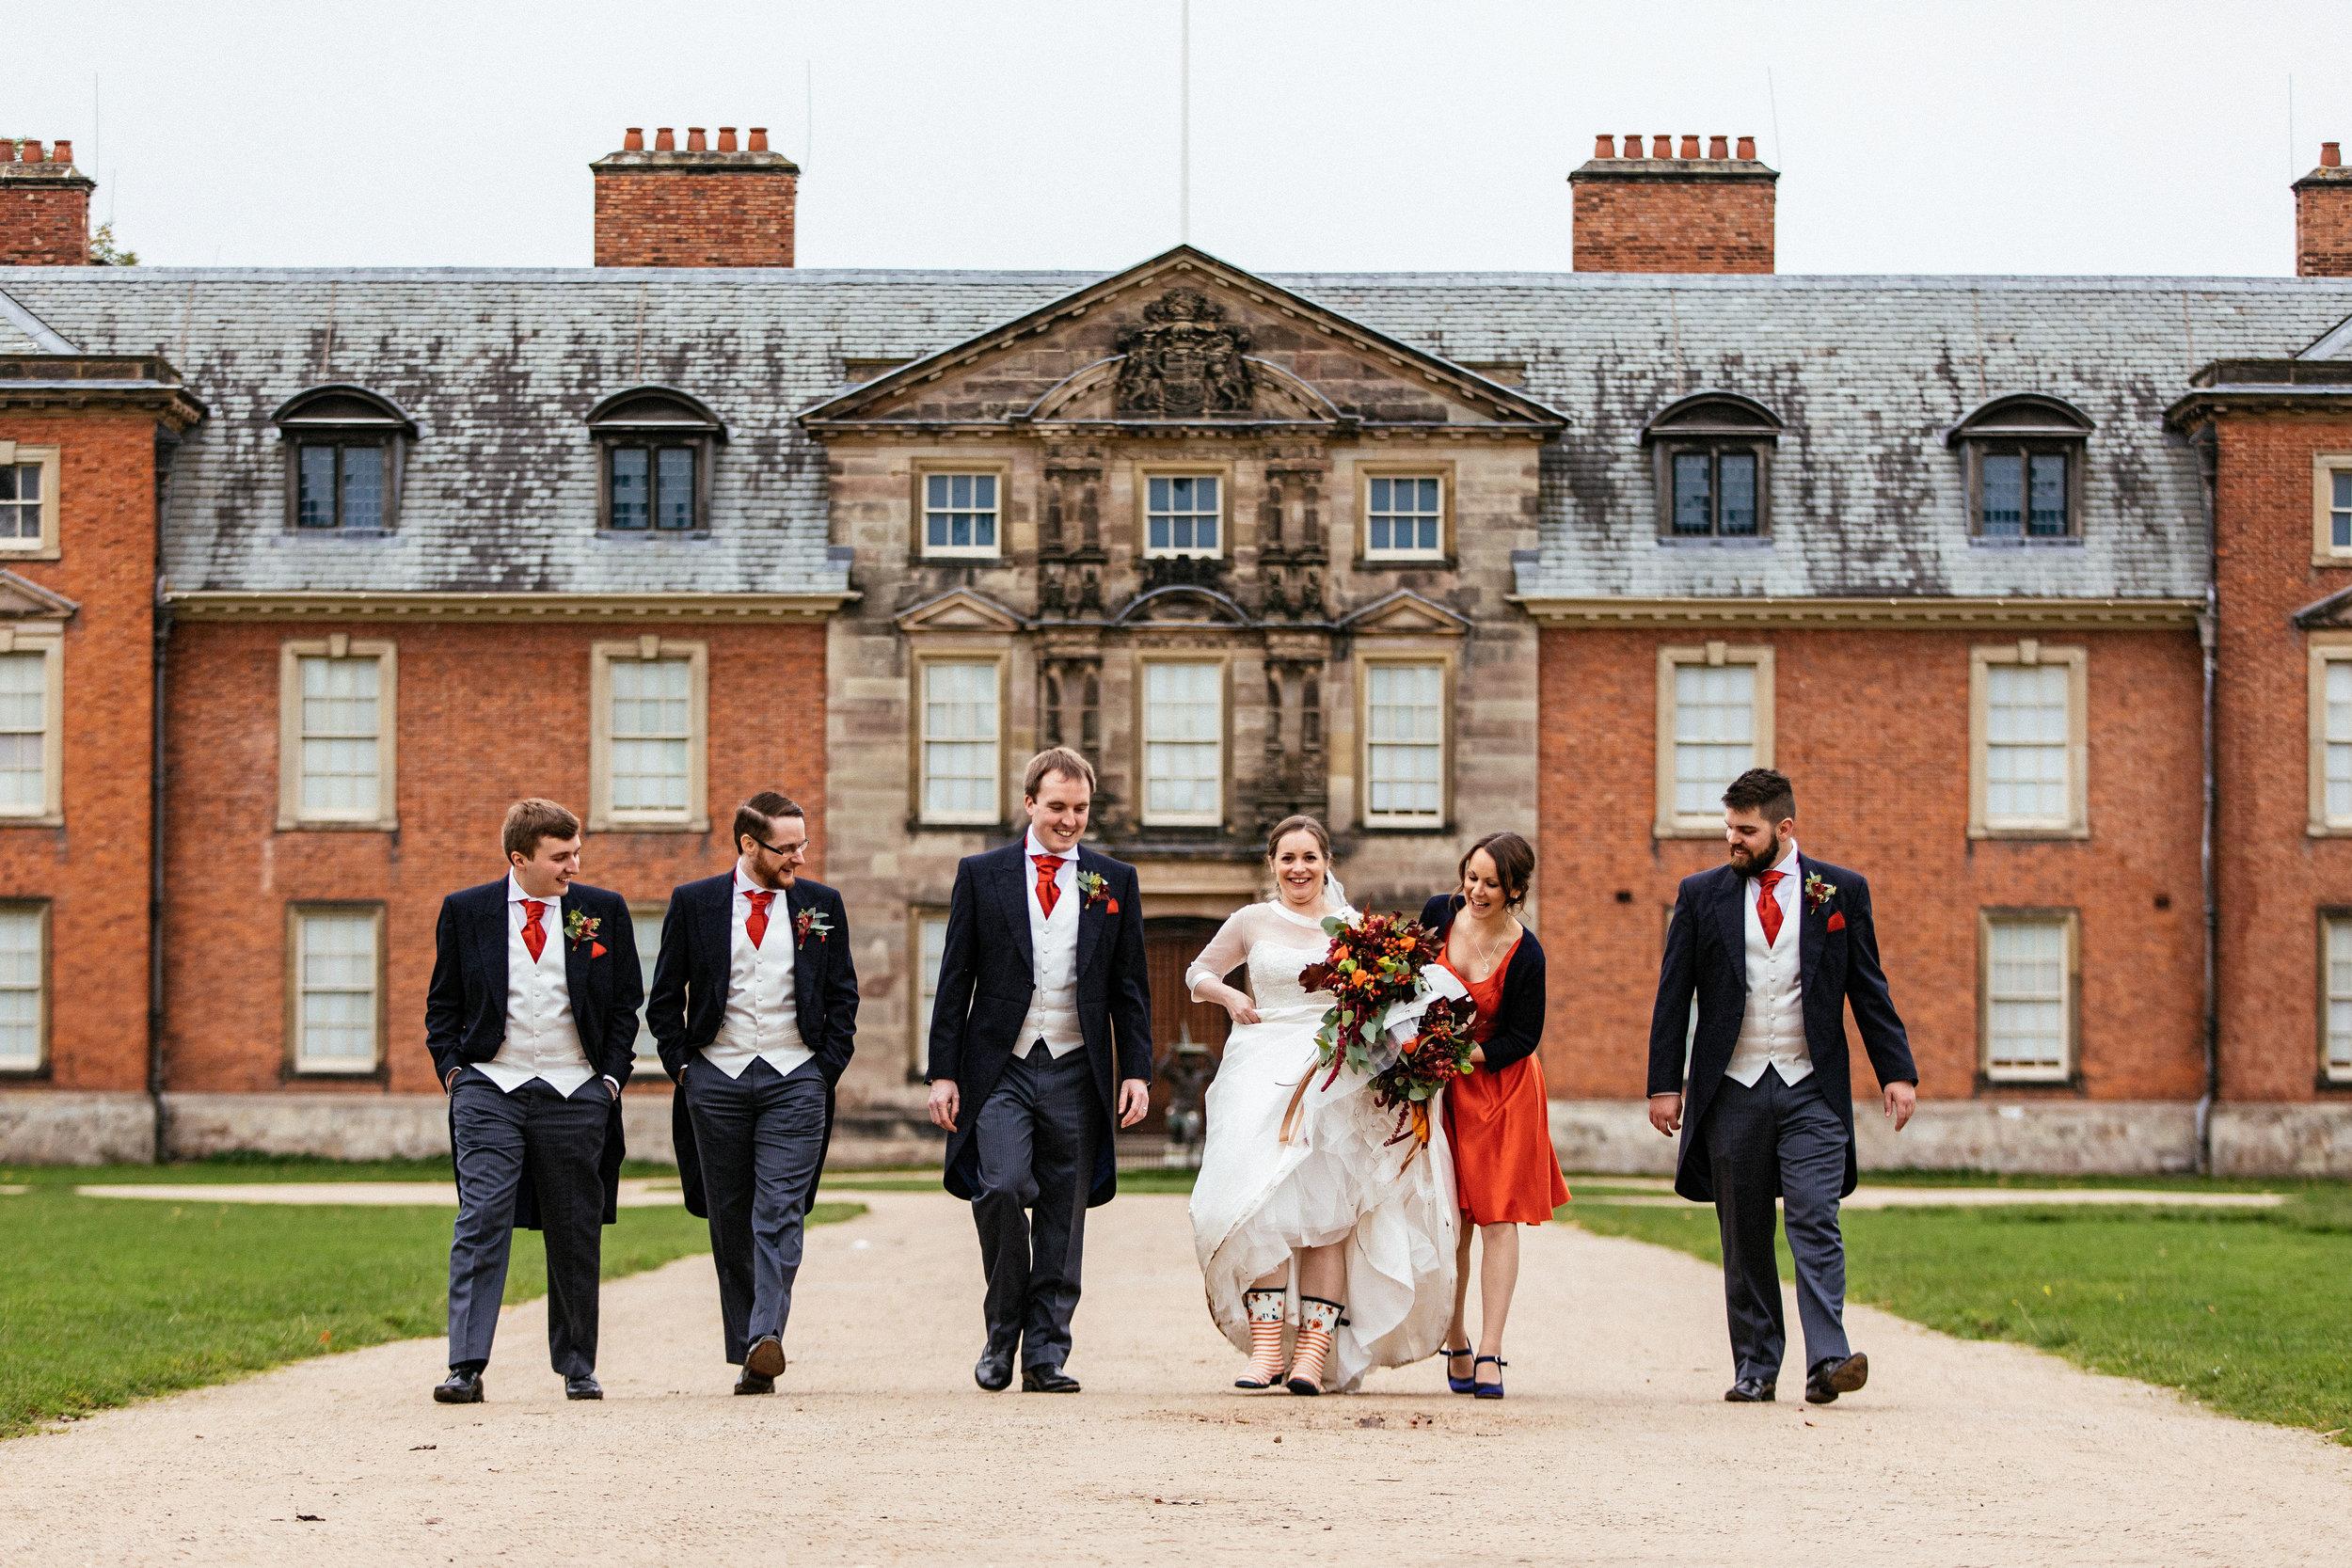 Dunham-Massey-Wedding-Photographer-85.jpg